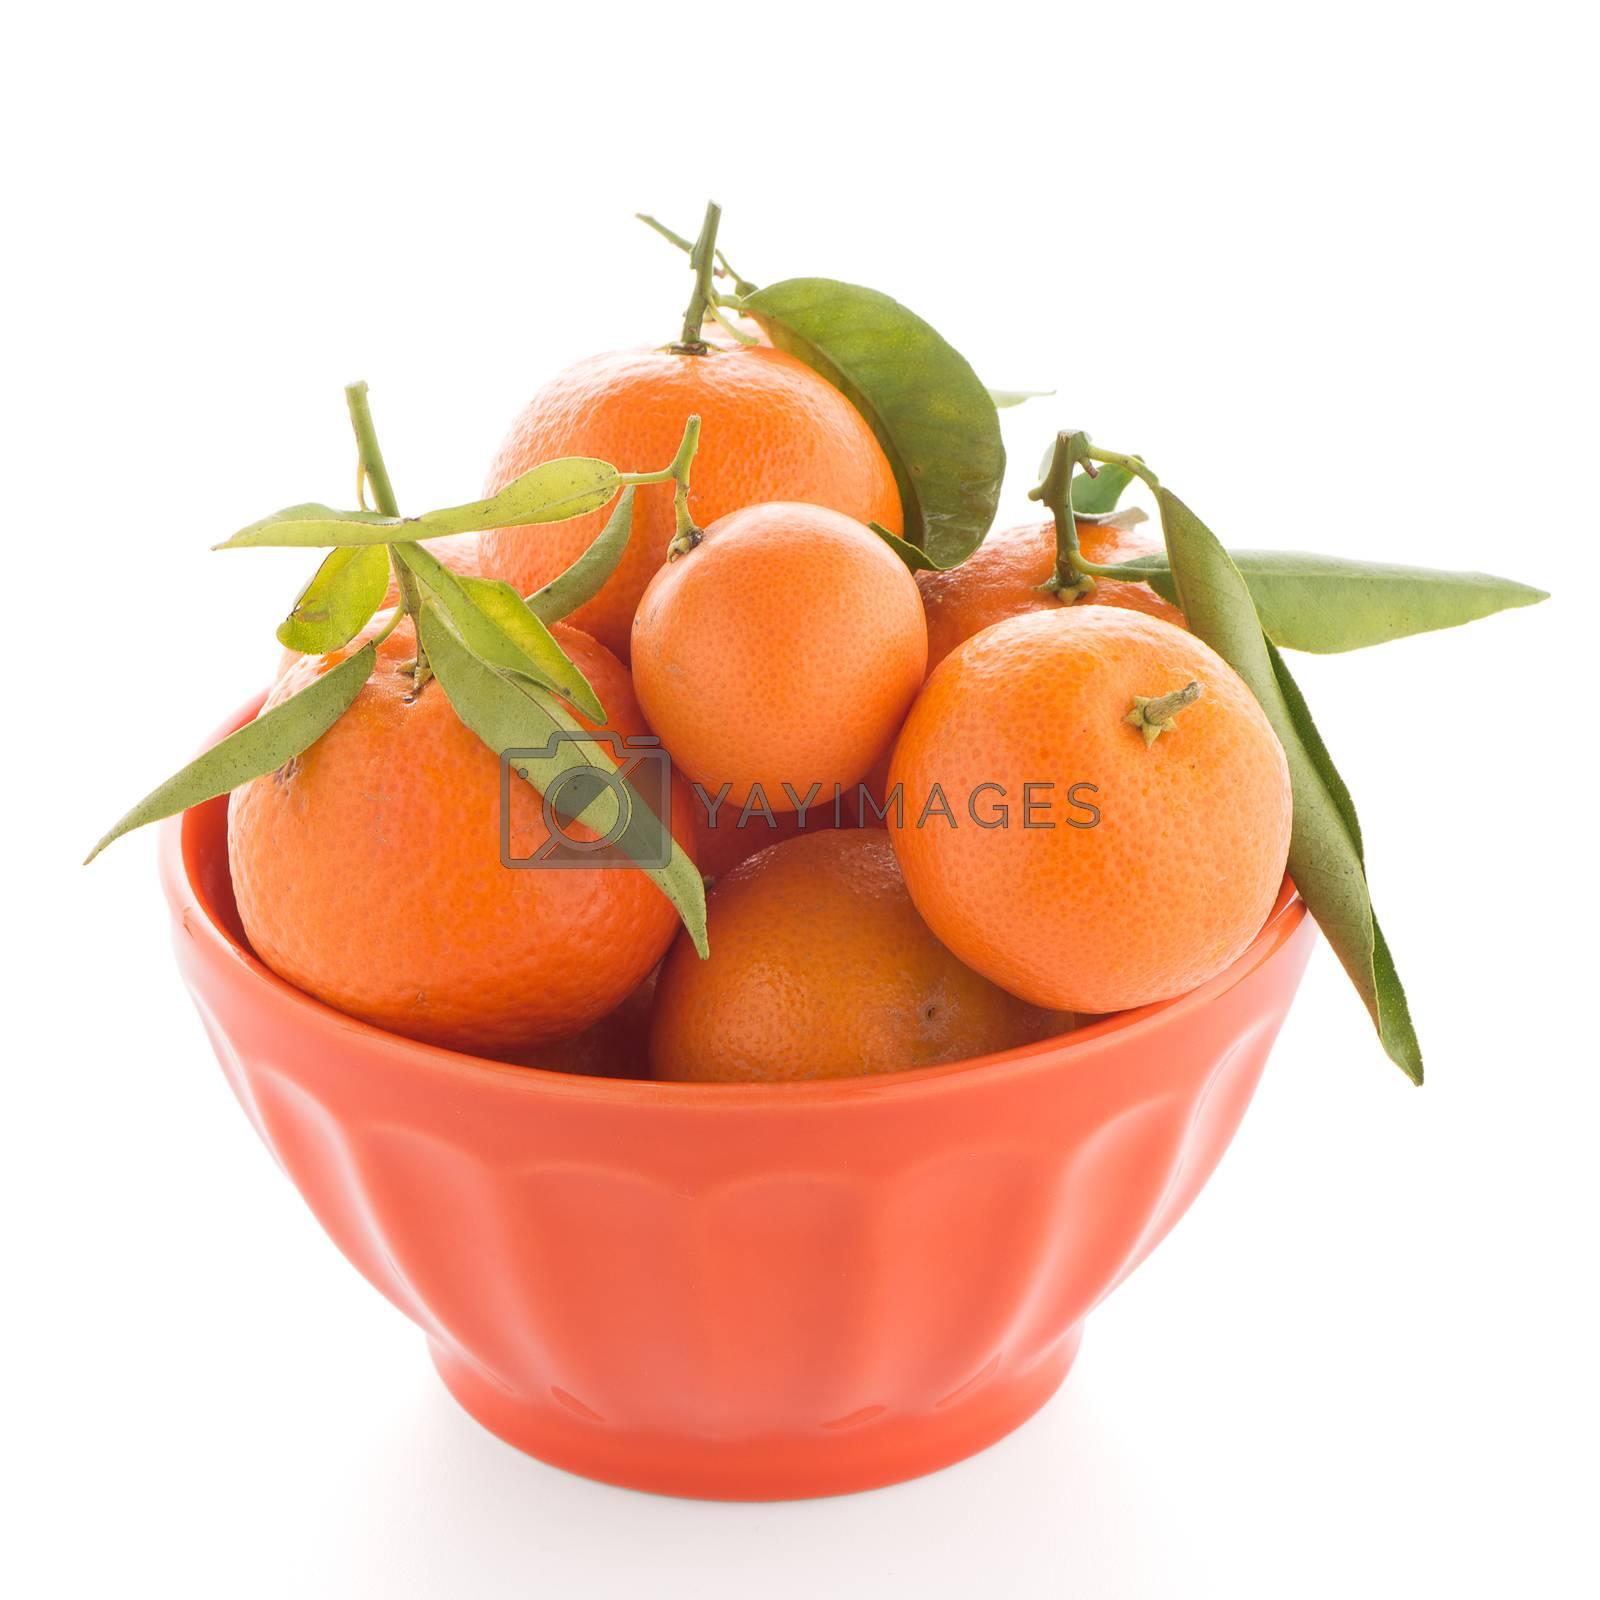 Royalty free image of Tangerines on ceramic orange bowl  by homydesign